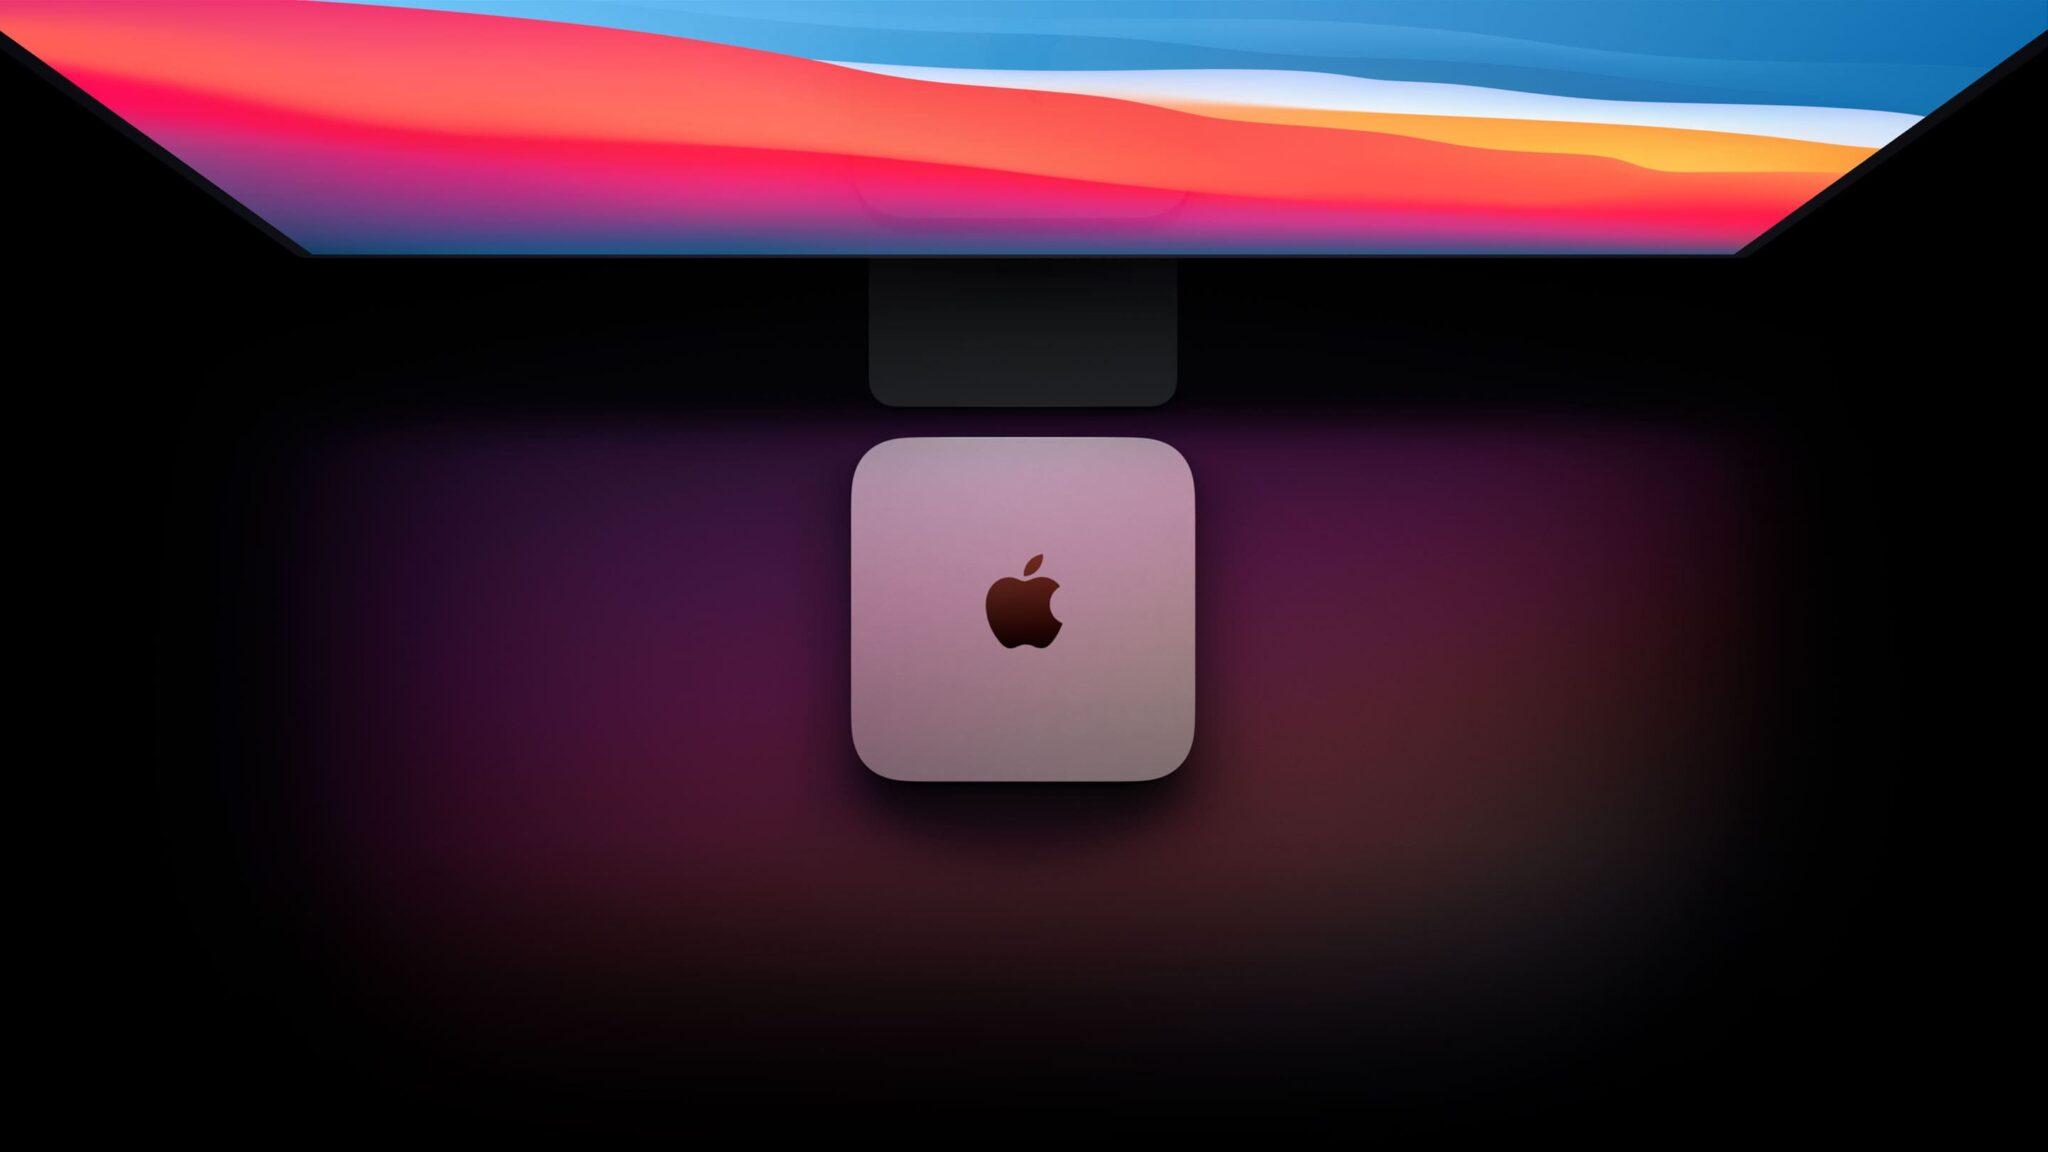 nuevo mac mini 2020 chipset m1 scaled